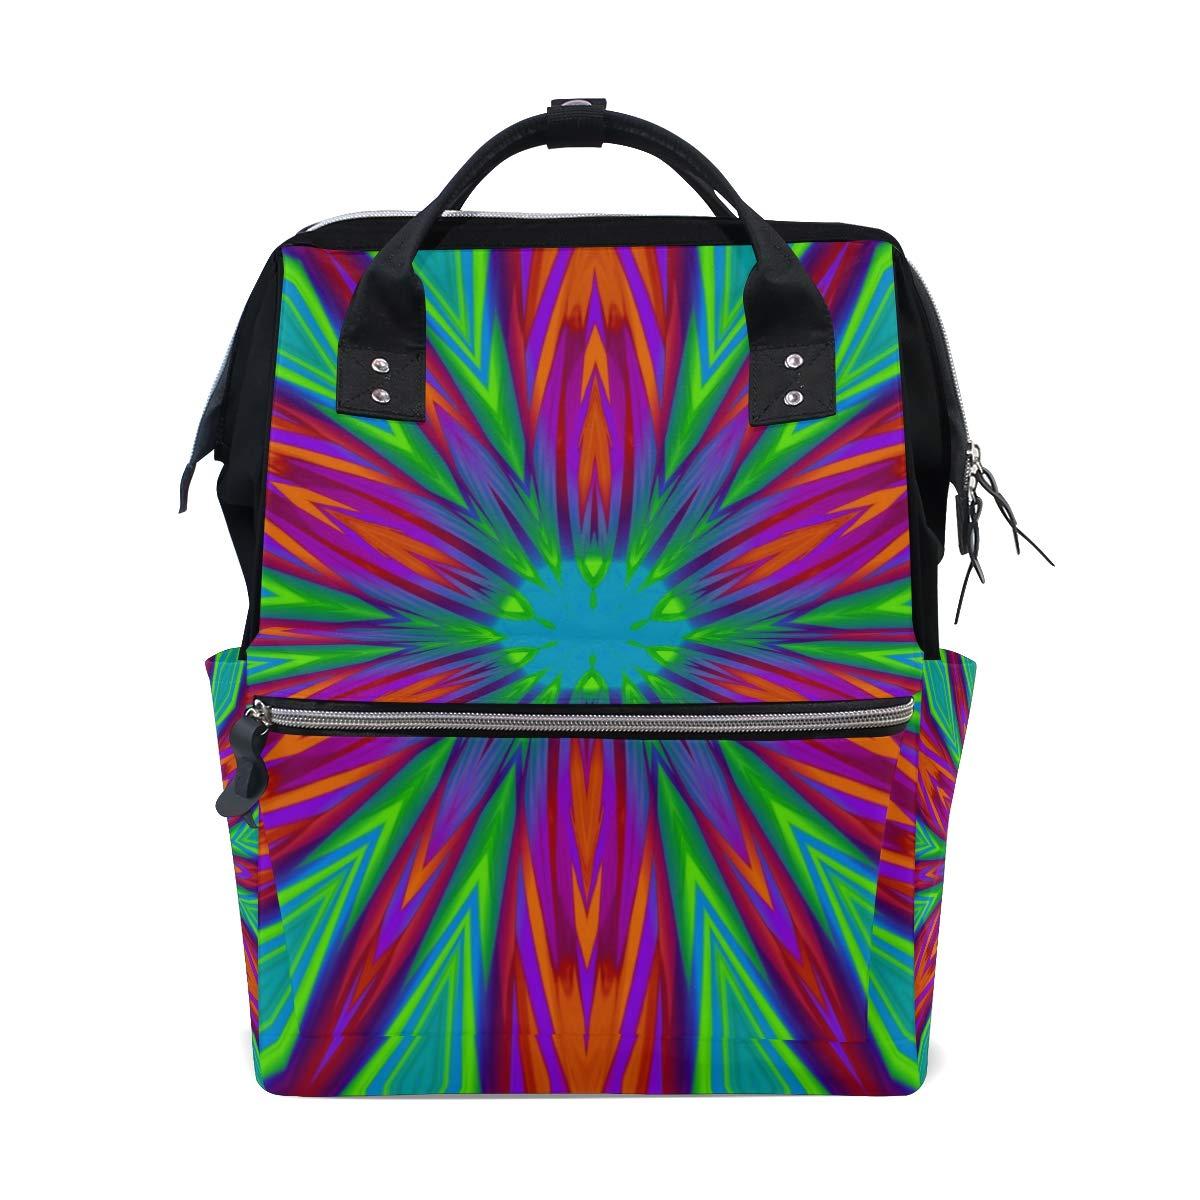 Diaper Bag Backpack Amazing Kaleidoscope Pattern Multipurpose Travel Backpack